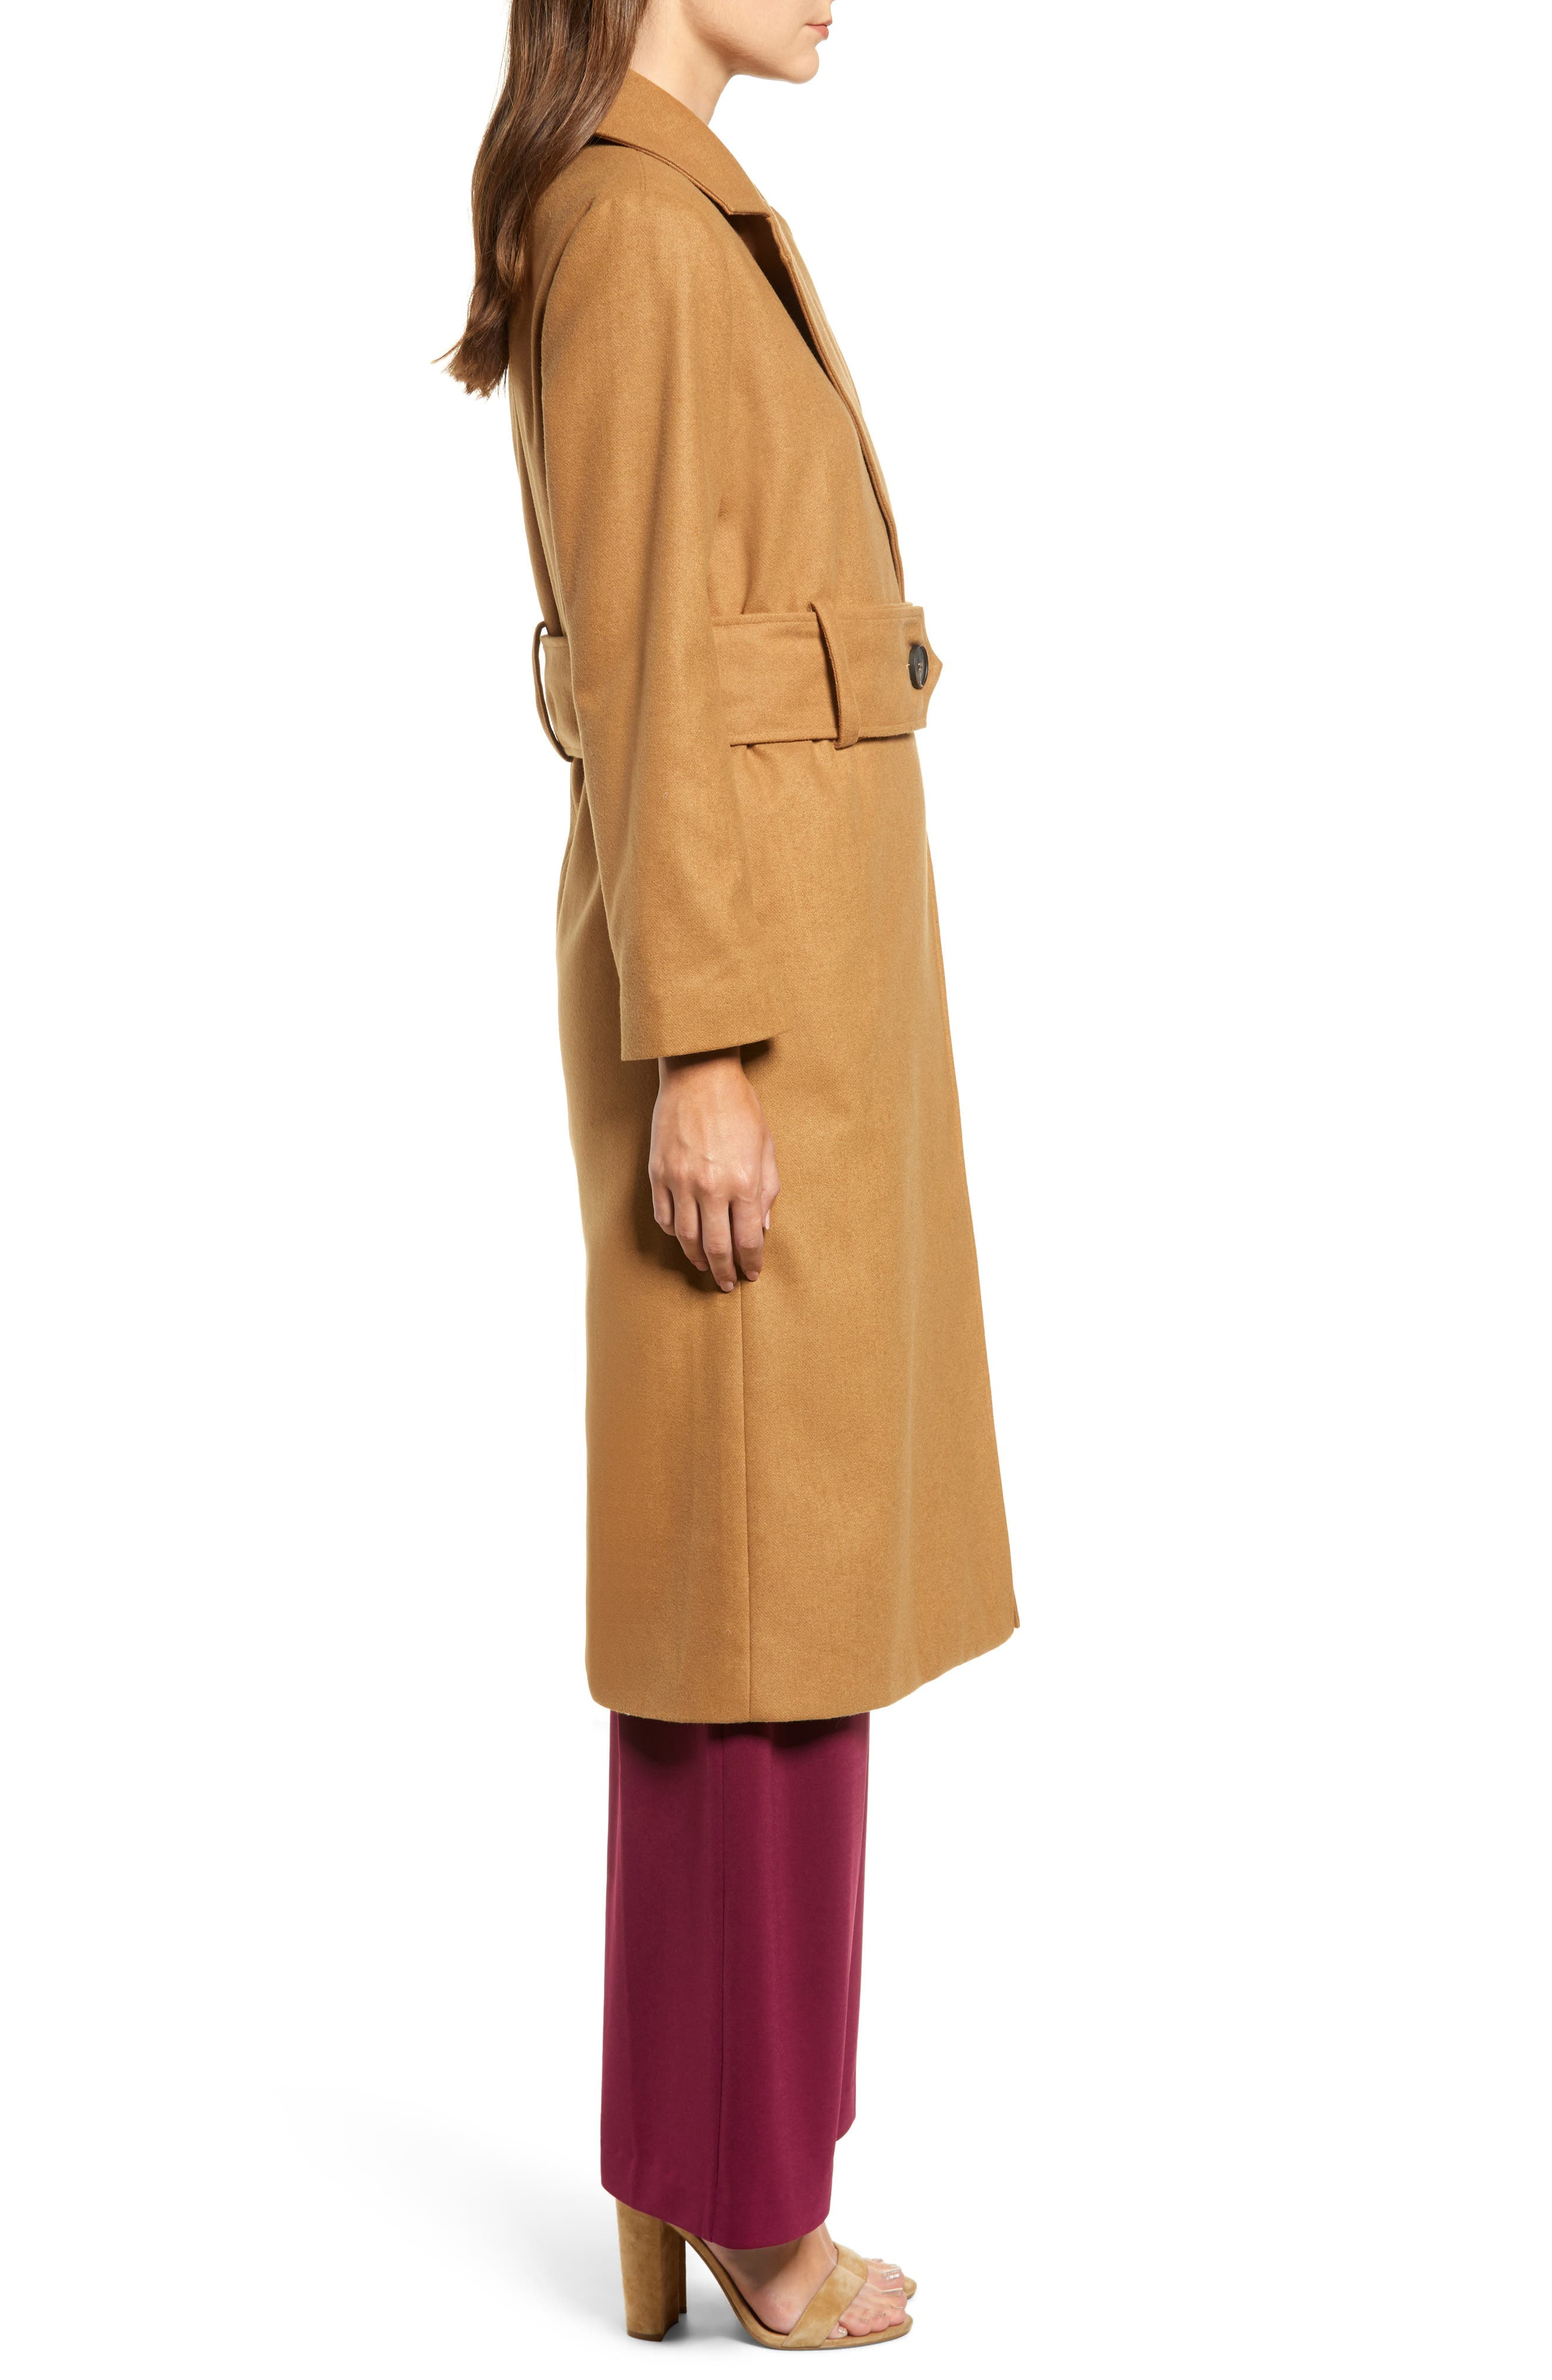 Chriselle Lim Victoria Belted Coat,                             Alternate thumbnail 4, color,                             CAMEL